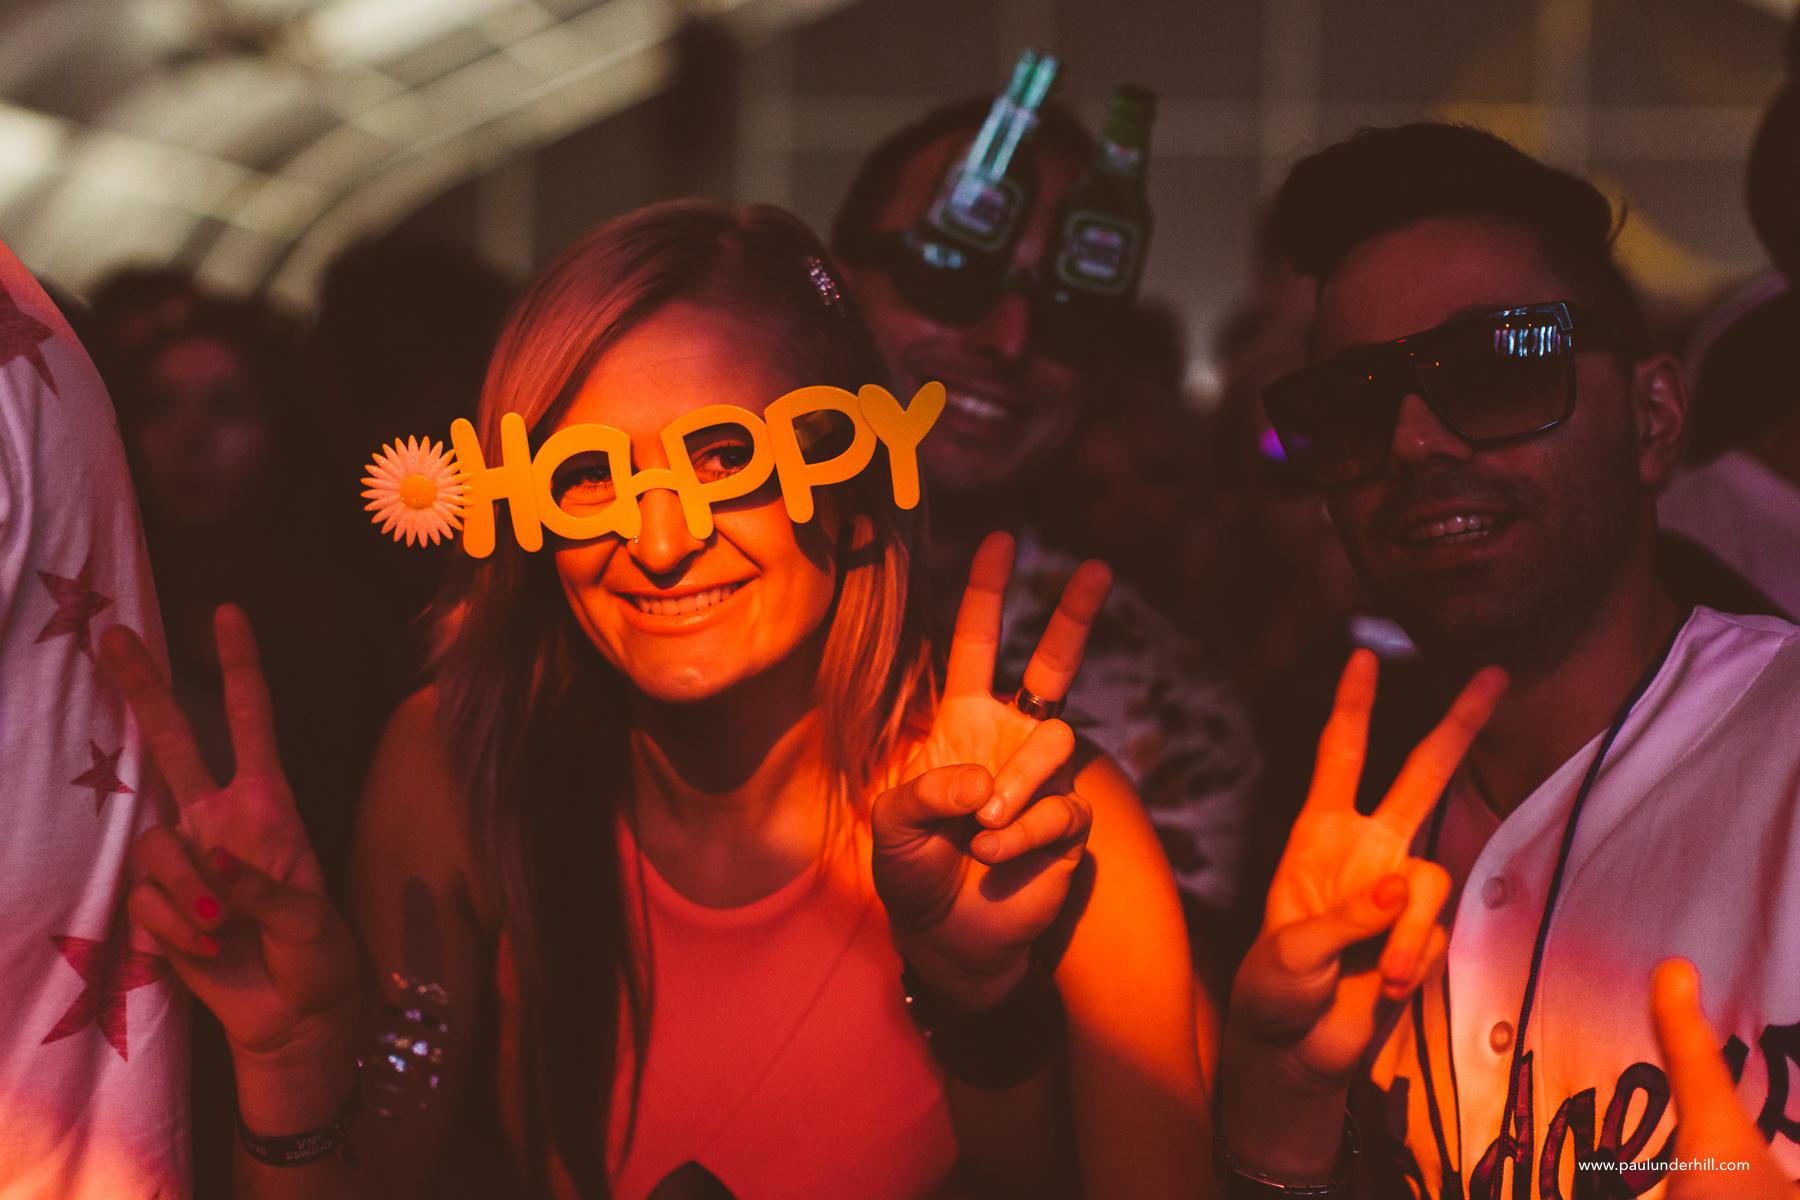 Festival-photographers-00007